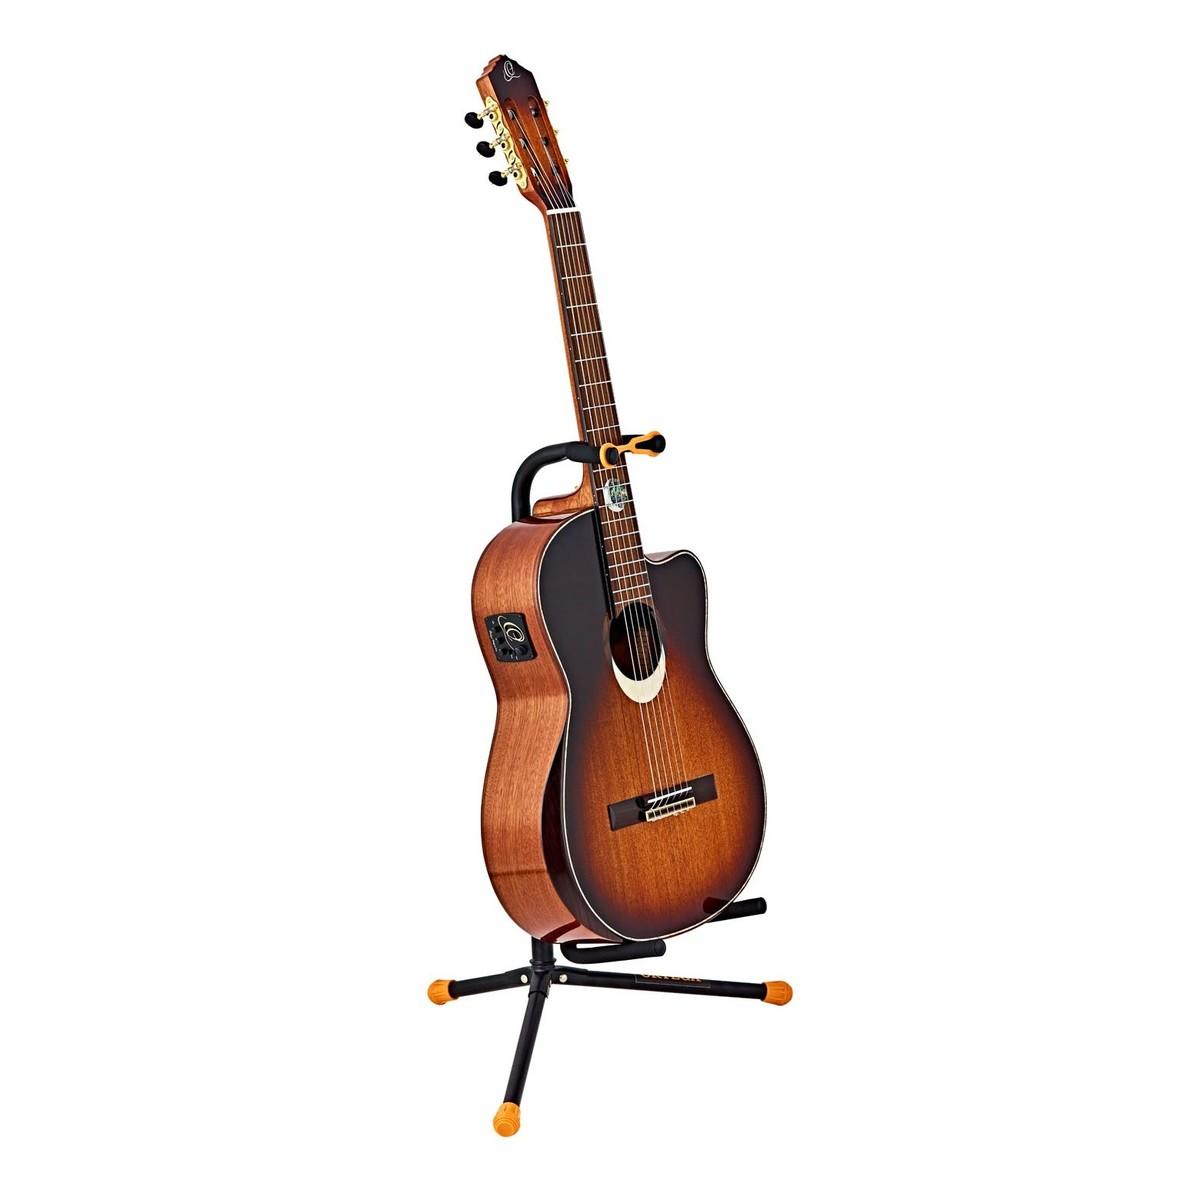 Ortega Ogs 1bk Guitar Stand Orange Black At Gear4music